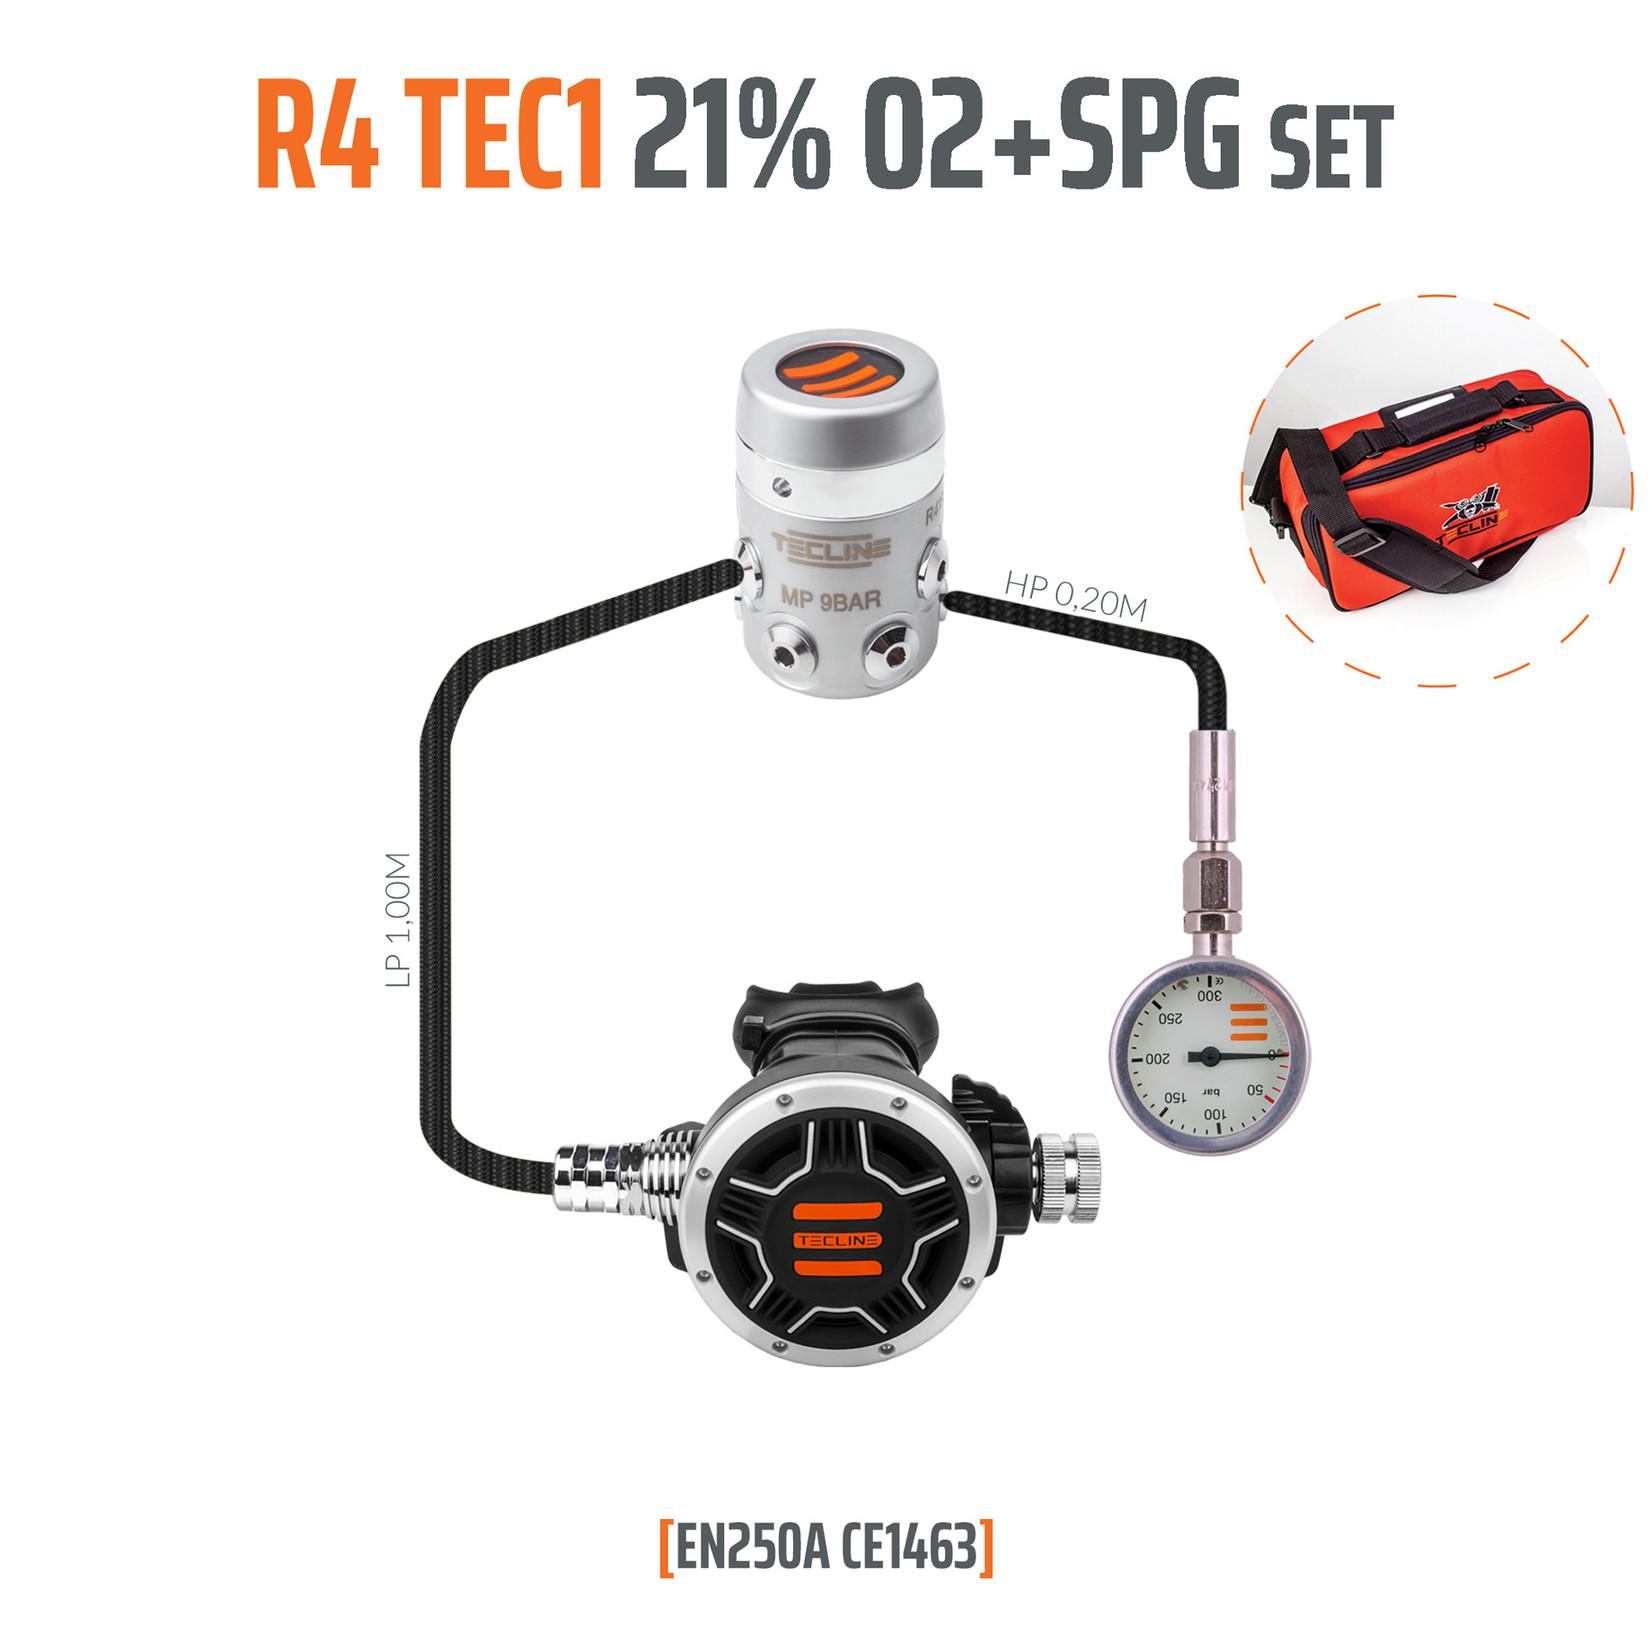 Tecline Regulator R4 TEC1 21% O2 G5/8 with SPG,  stage set - EN250A